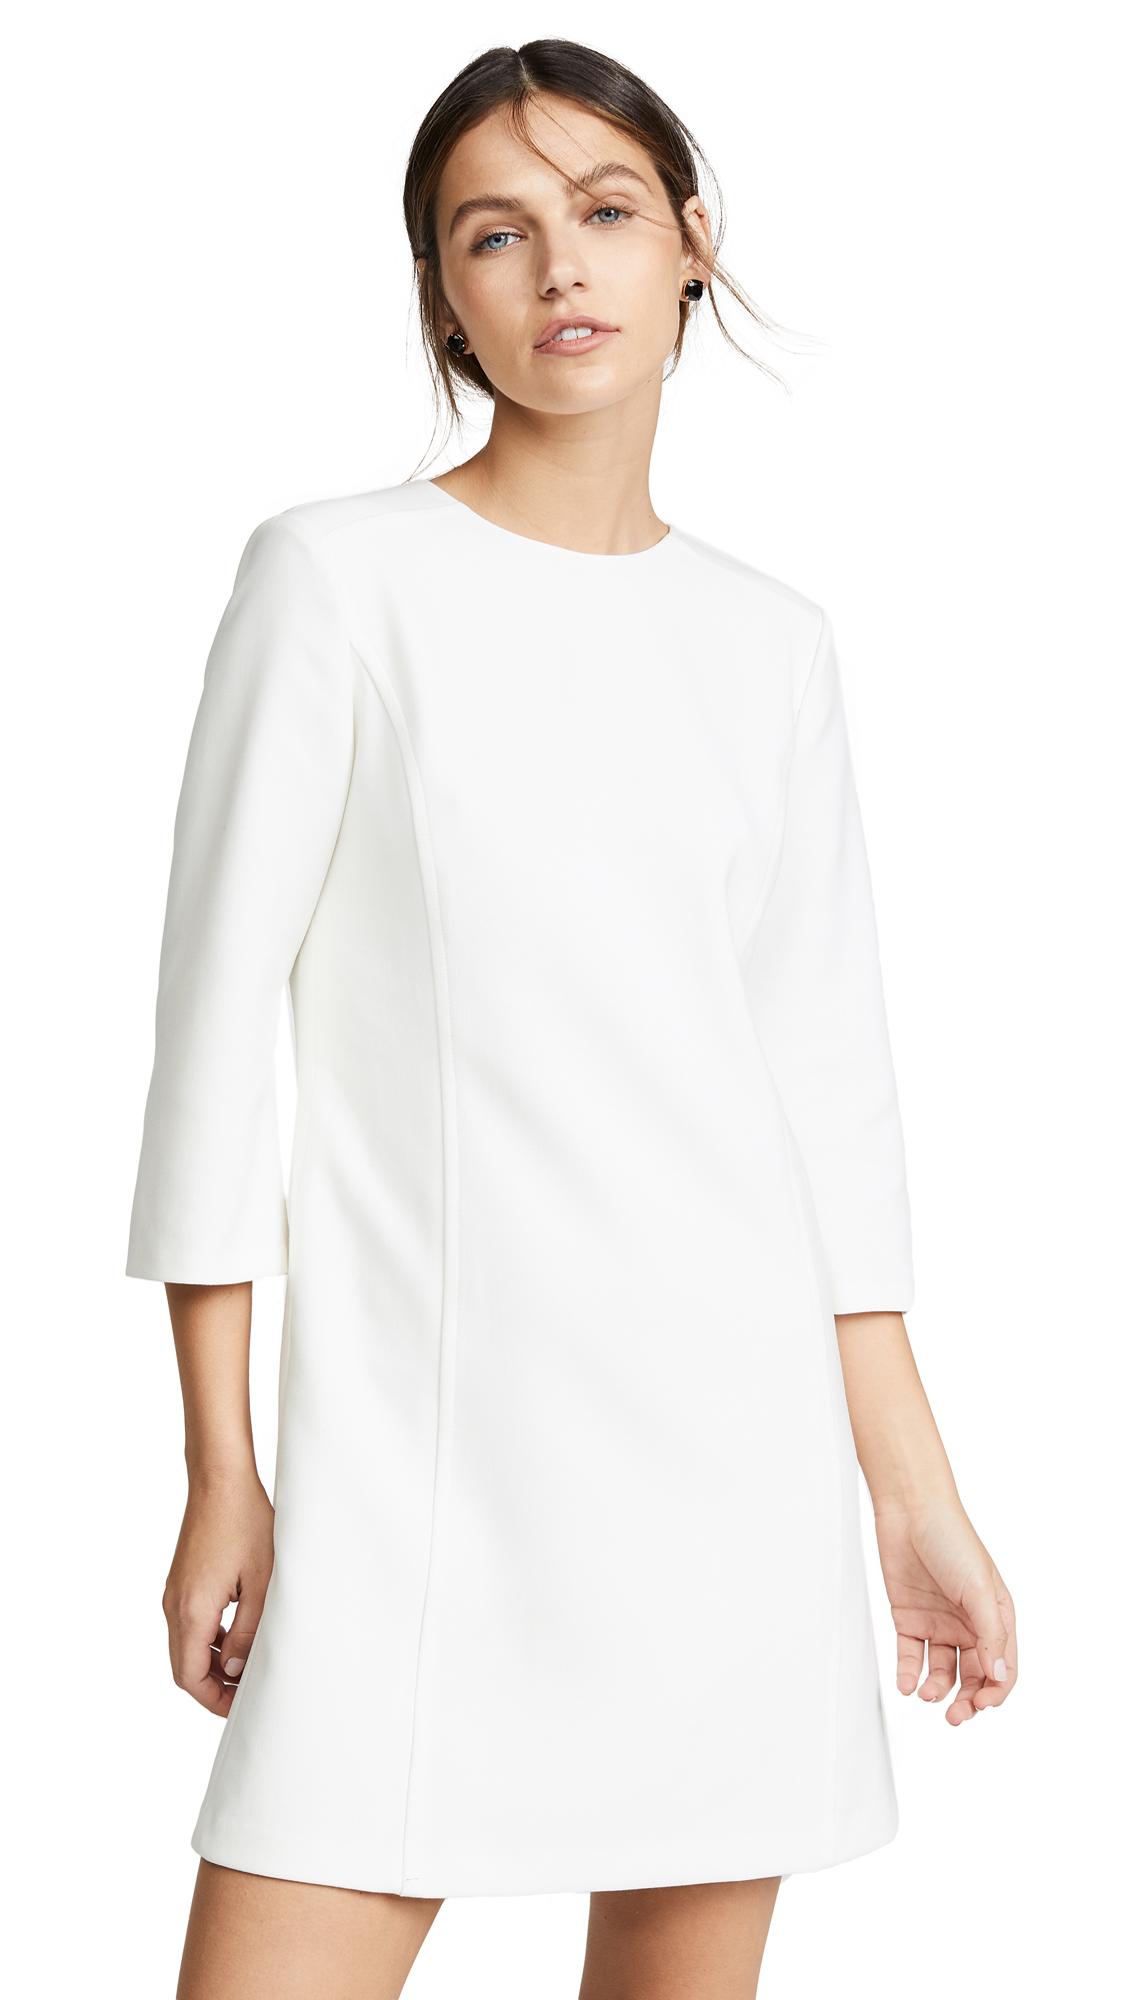 alice + olivia Gem 3/4 Sleeve Shift Dress - Off White